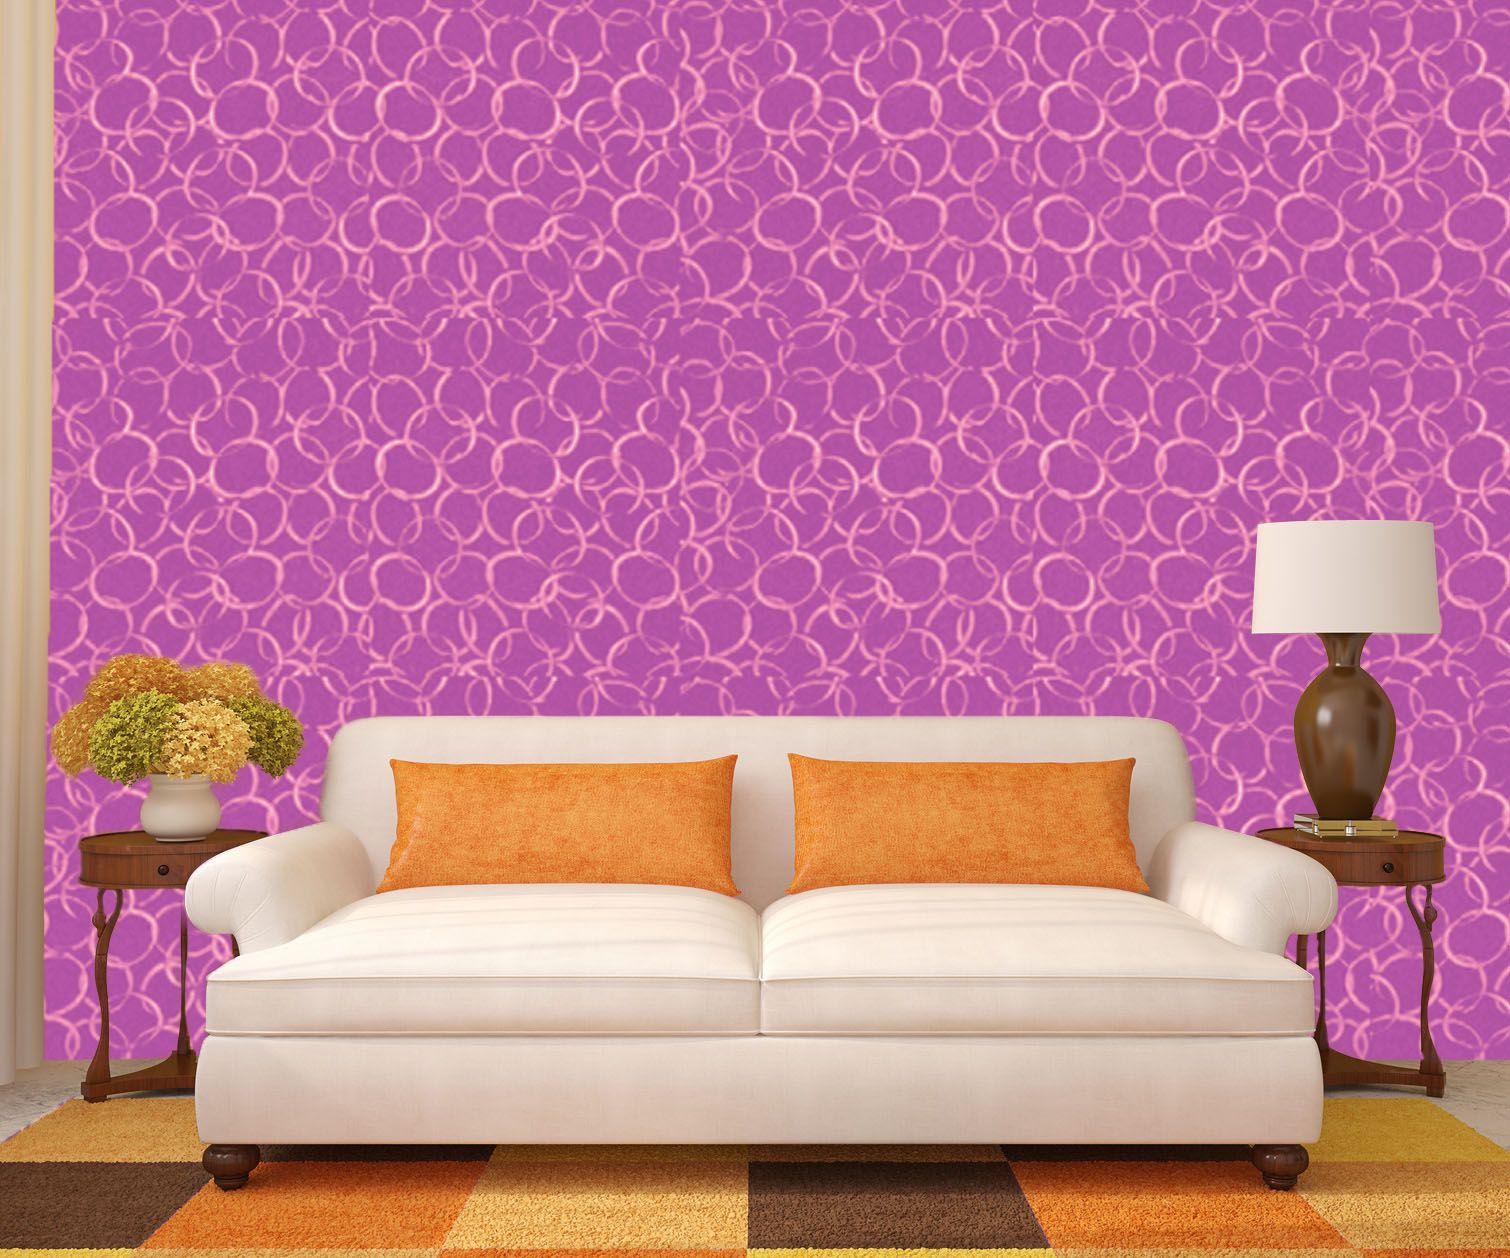 Fizz Texture Painting